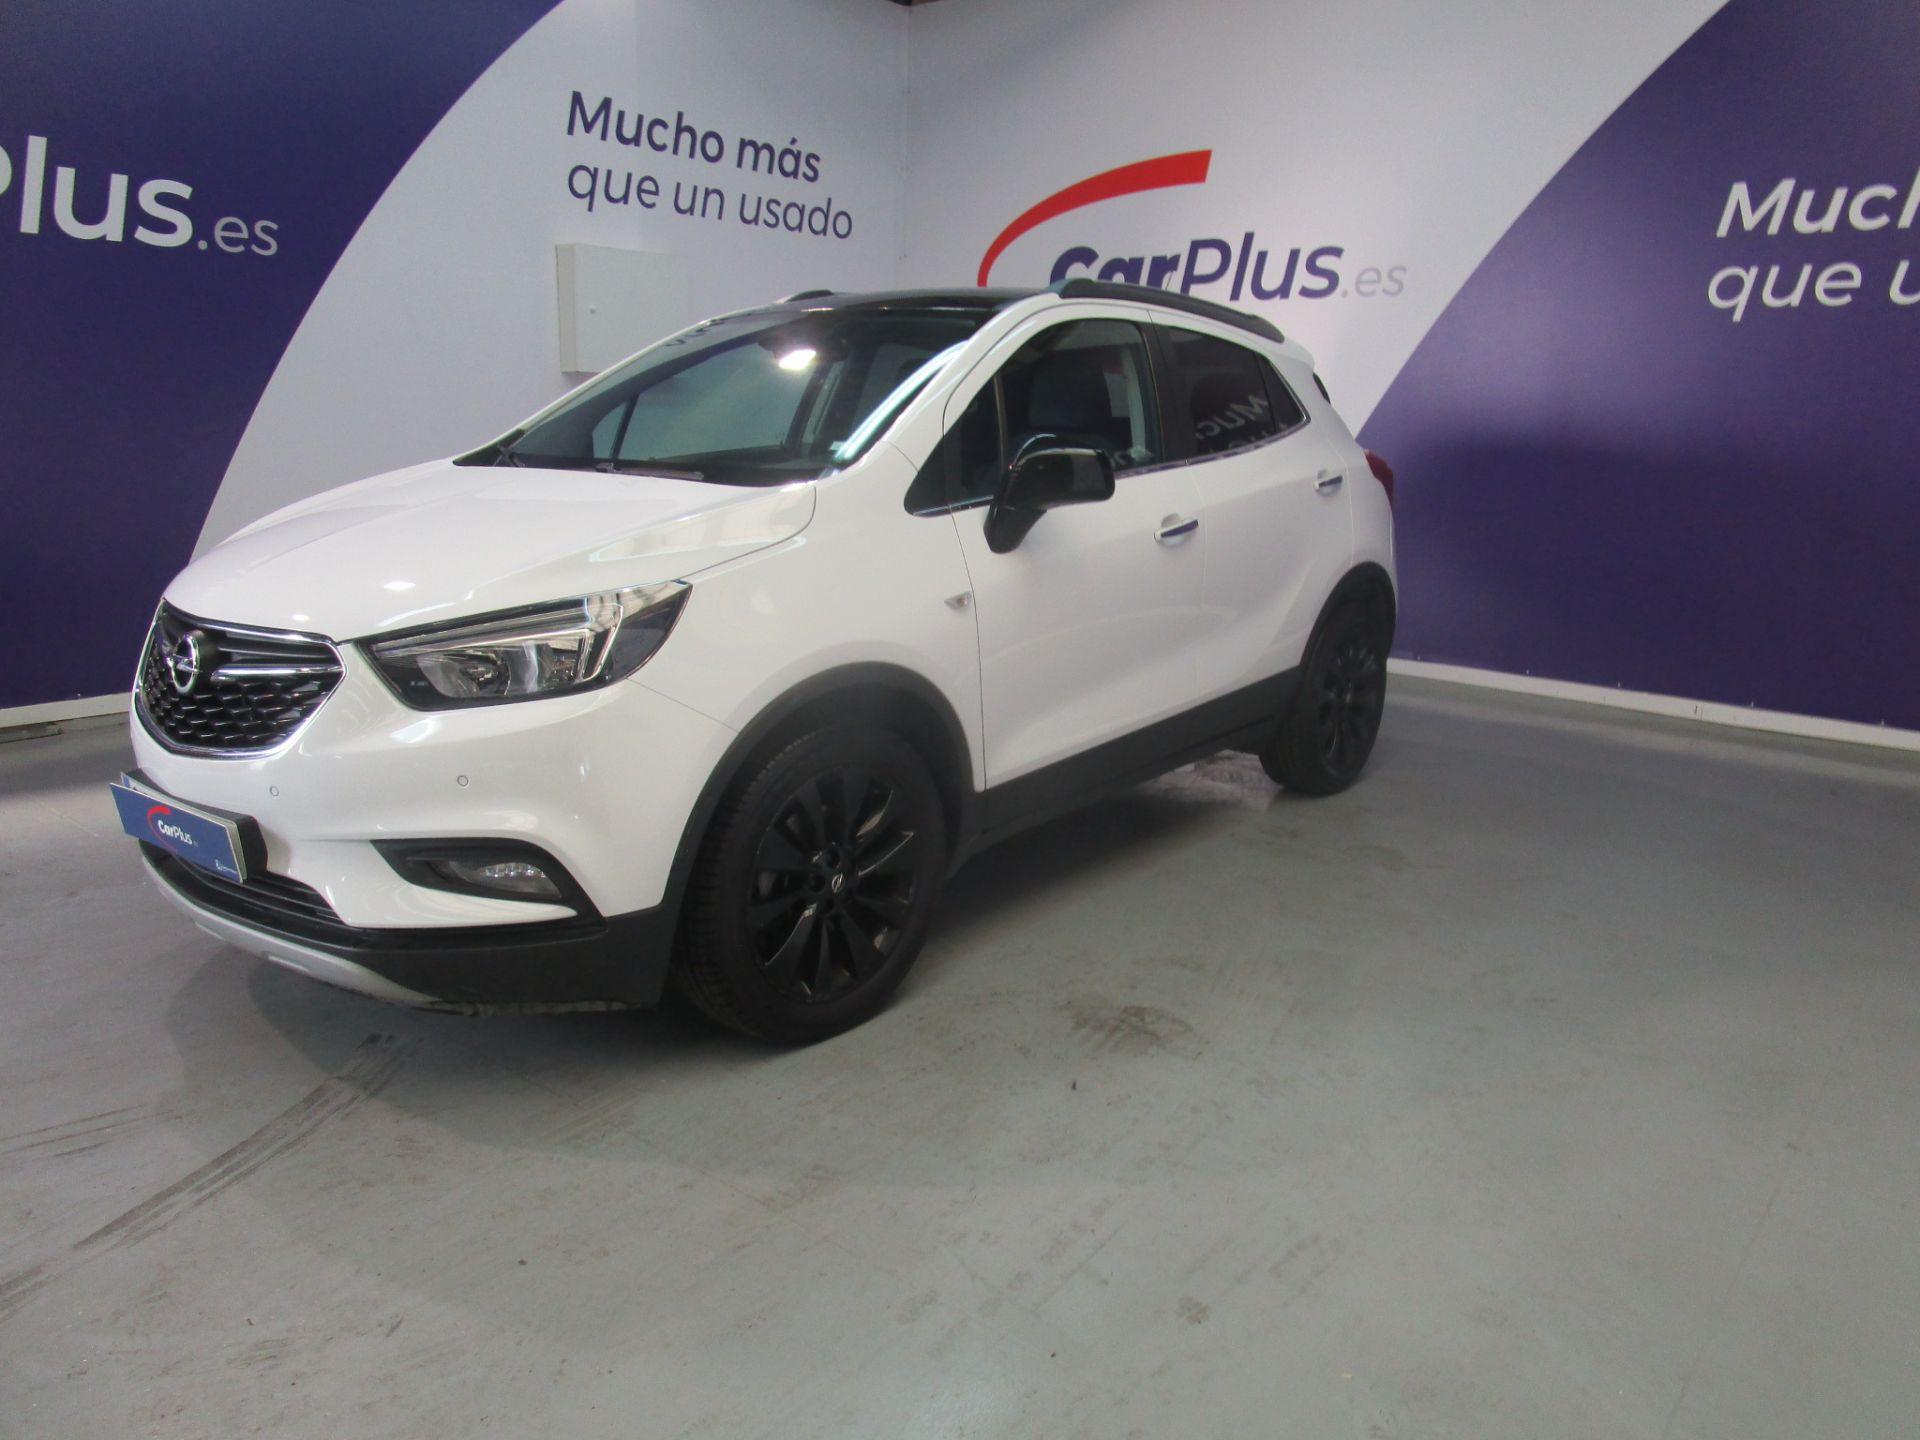 Opel Mokka X 1.6 CDTi 100kW 4X2 S&S Color Edition segunda mano Madrid